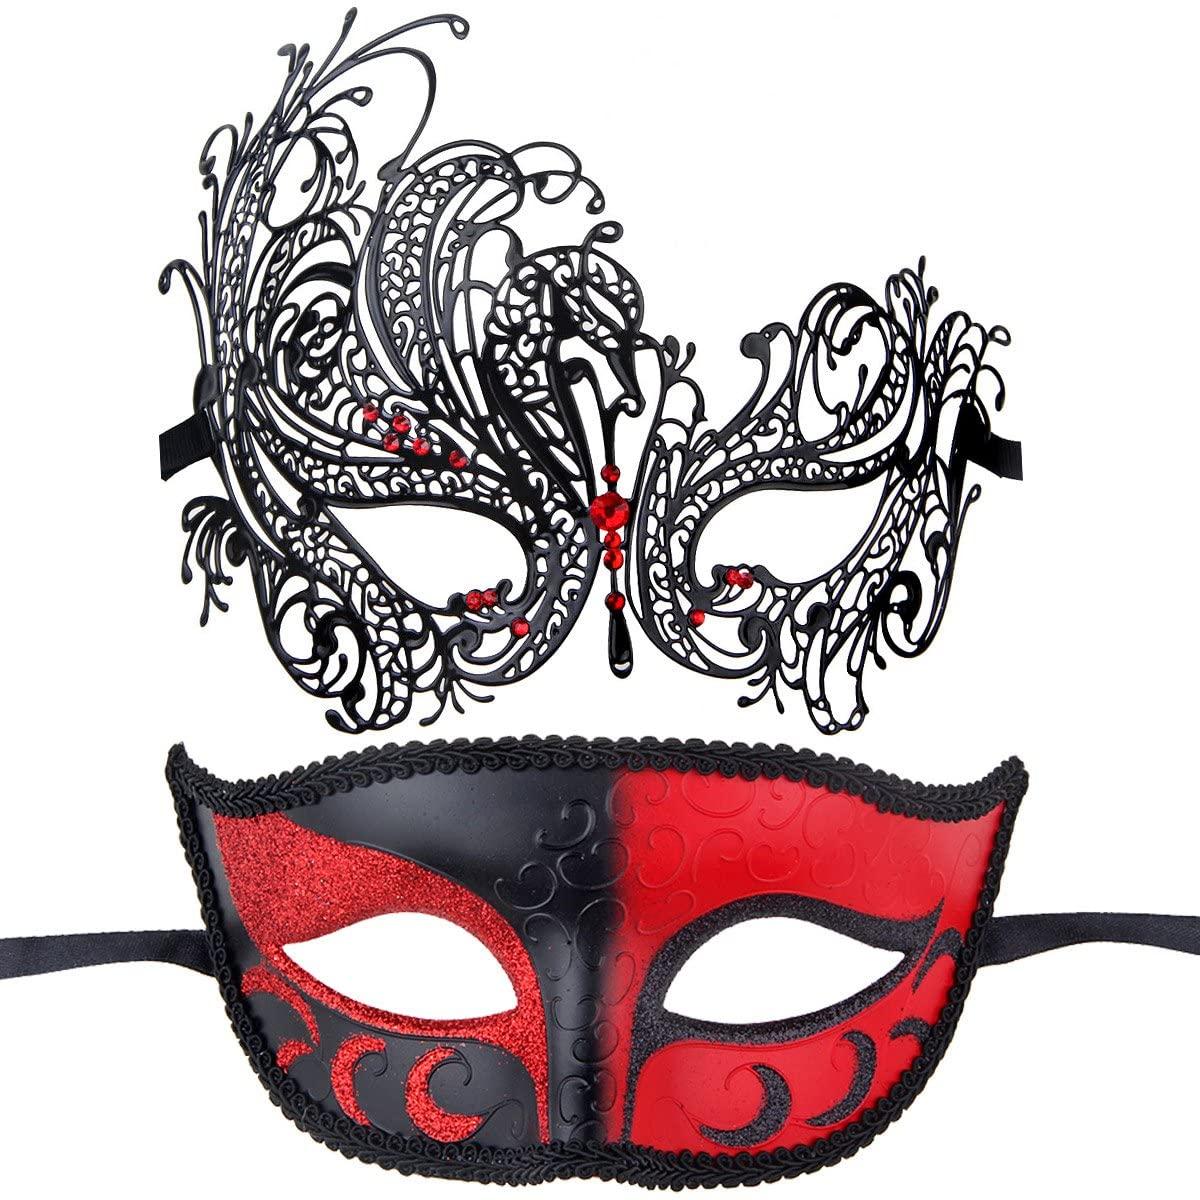 IETANG Couples Pair Half Venetian Masquerade Ball Masks Set Party Costume Accessory